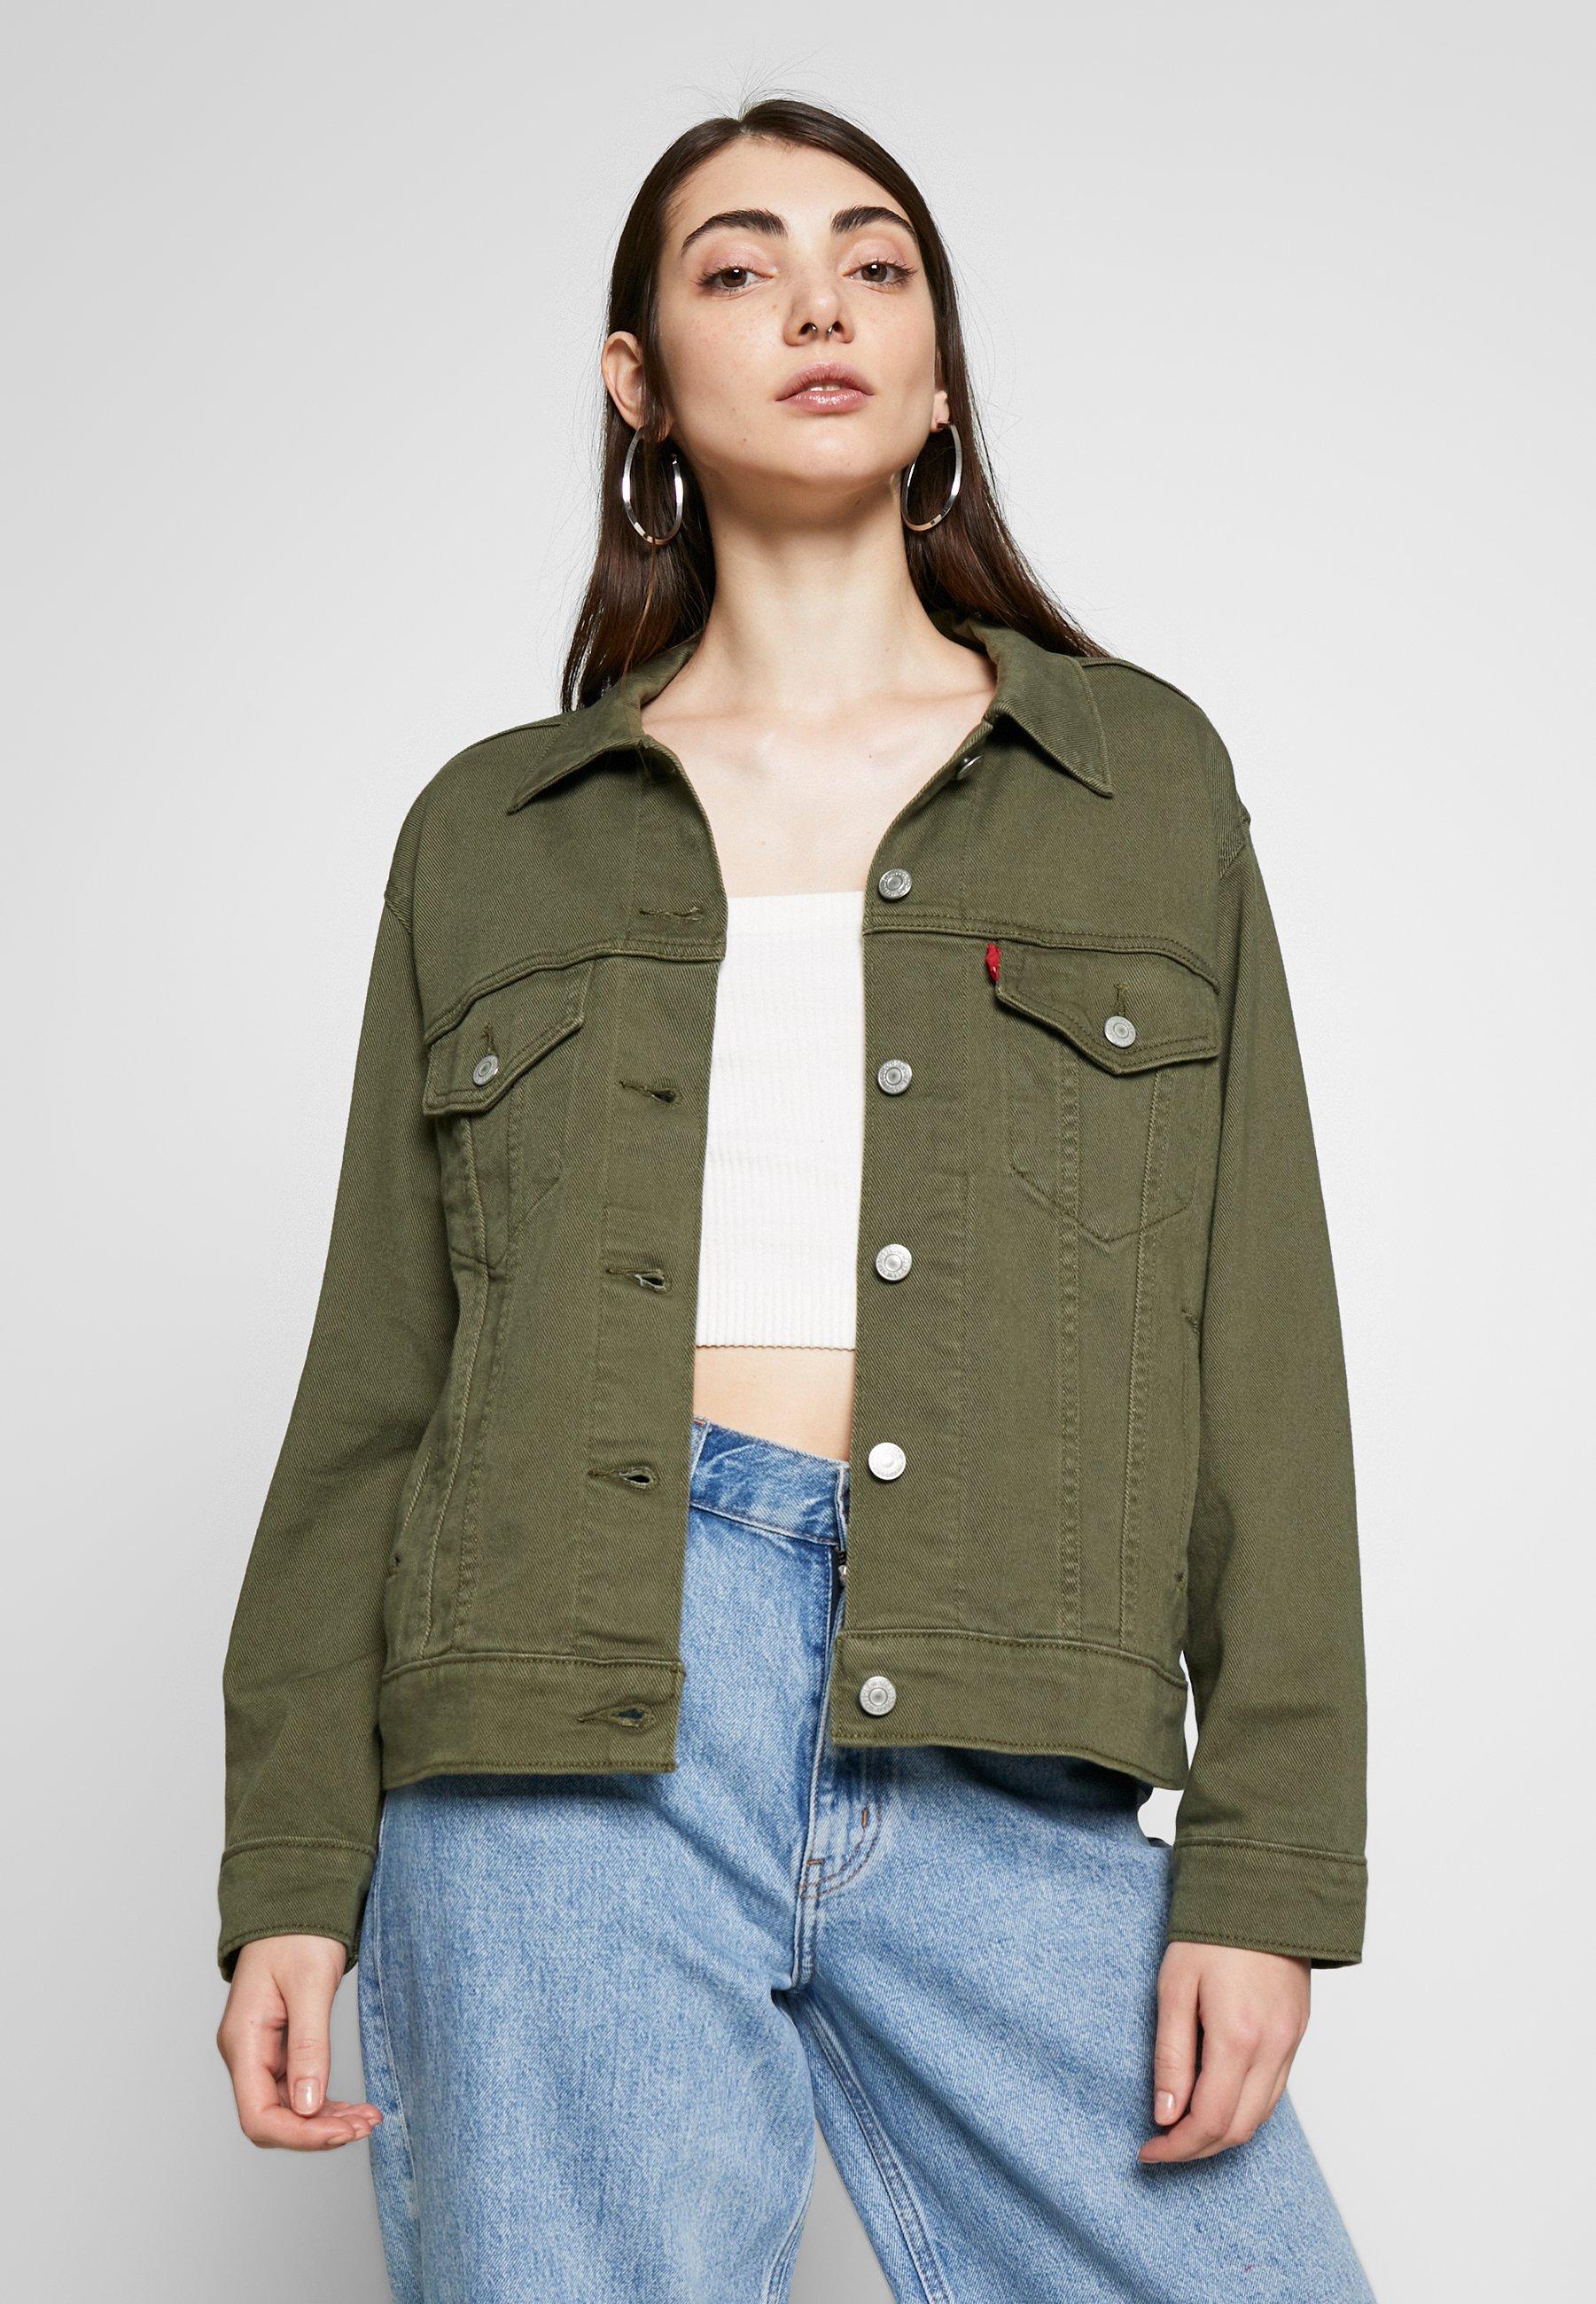 veste en jean femme kaki ou olive